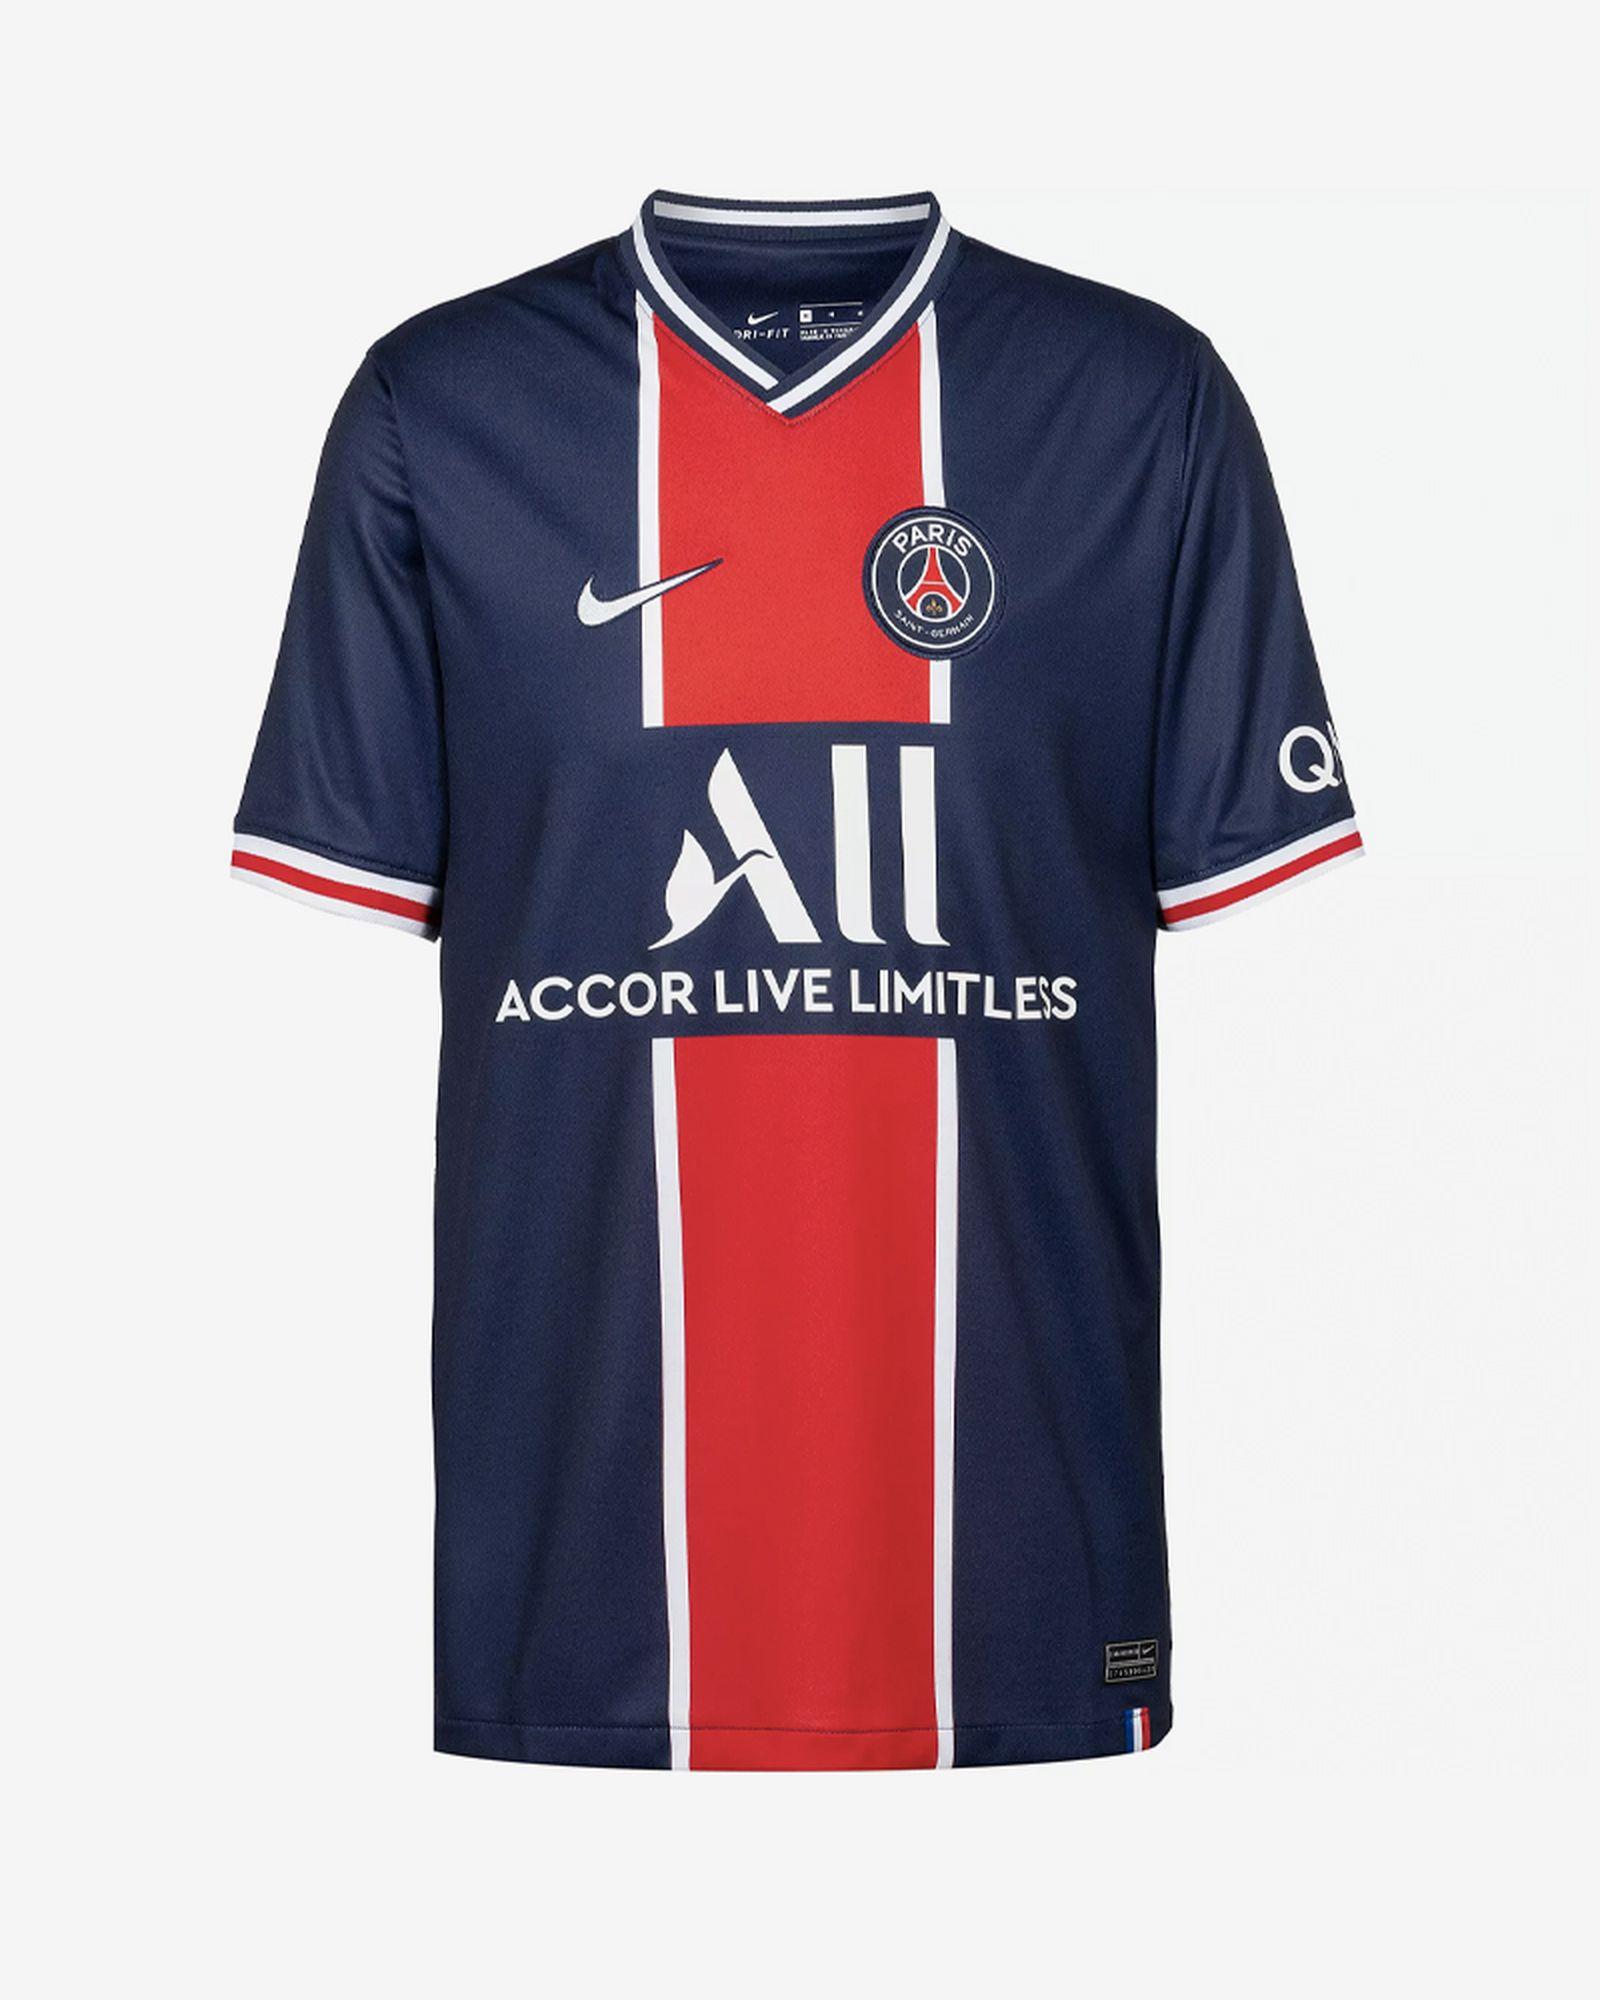 football-shirts-2020-review-13